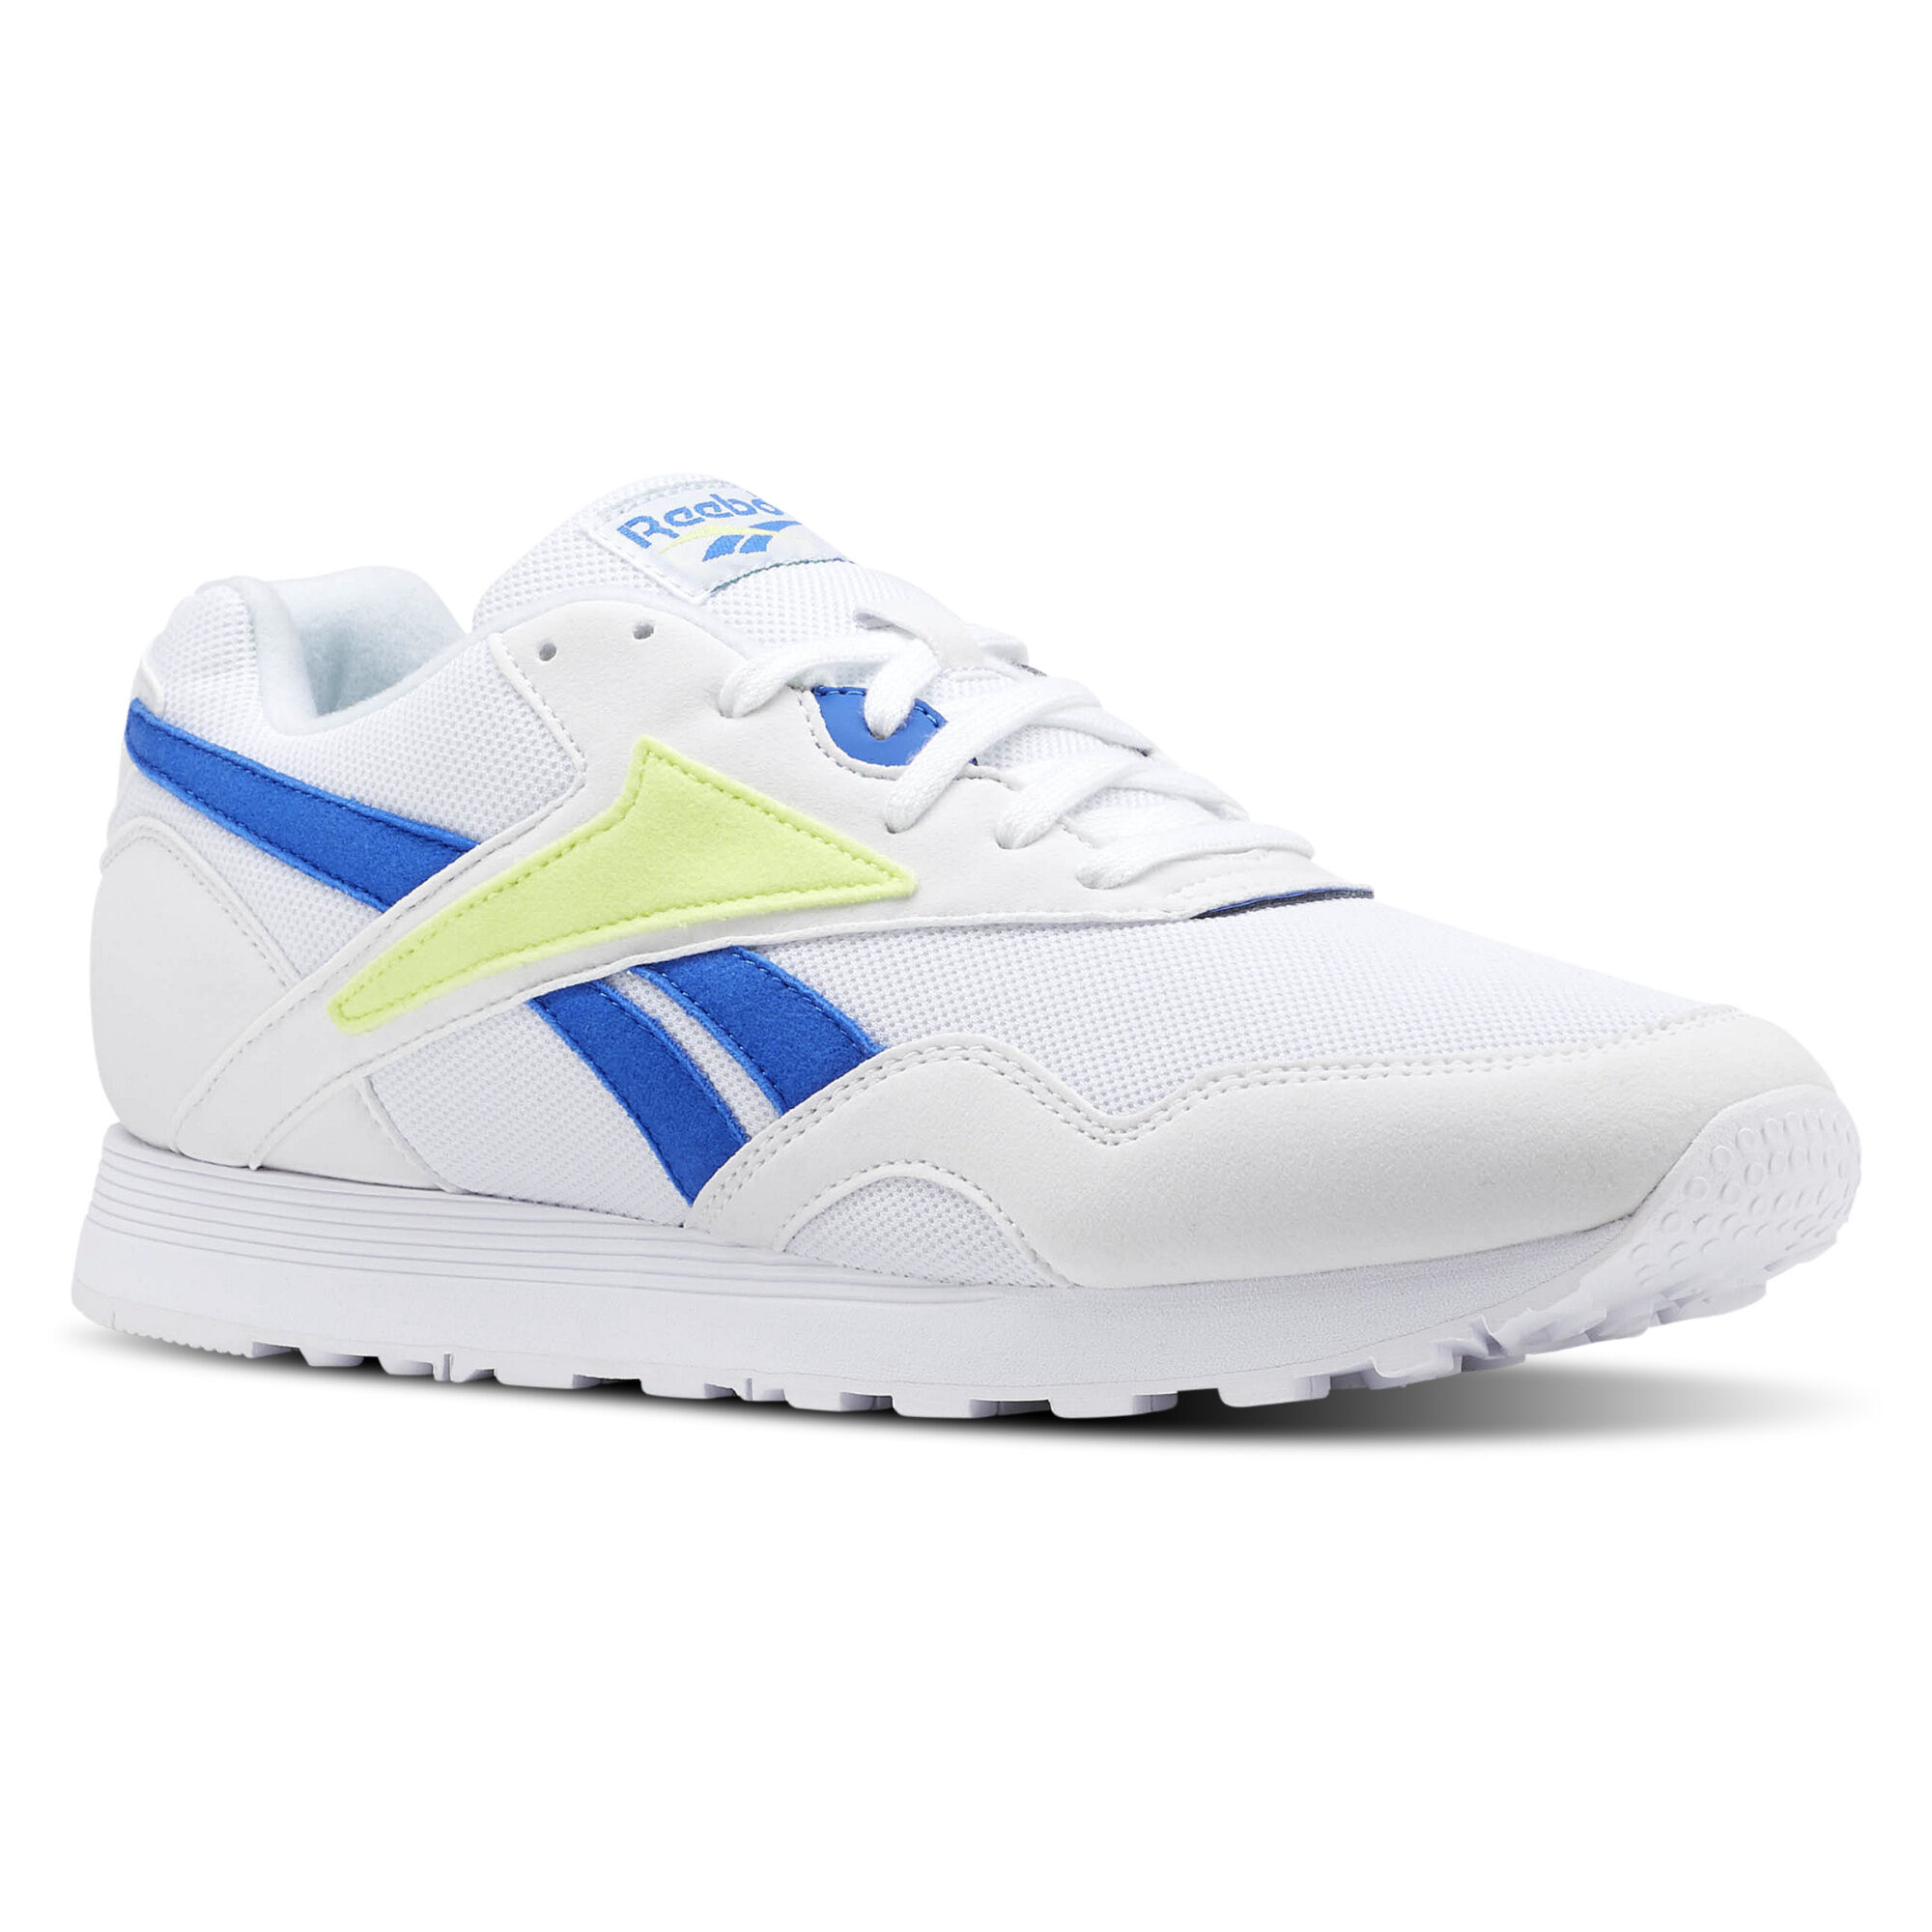 Reebok Classic RAPIDE - Trainers - white/vital blue/lemon agSy3Hqjlv